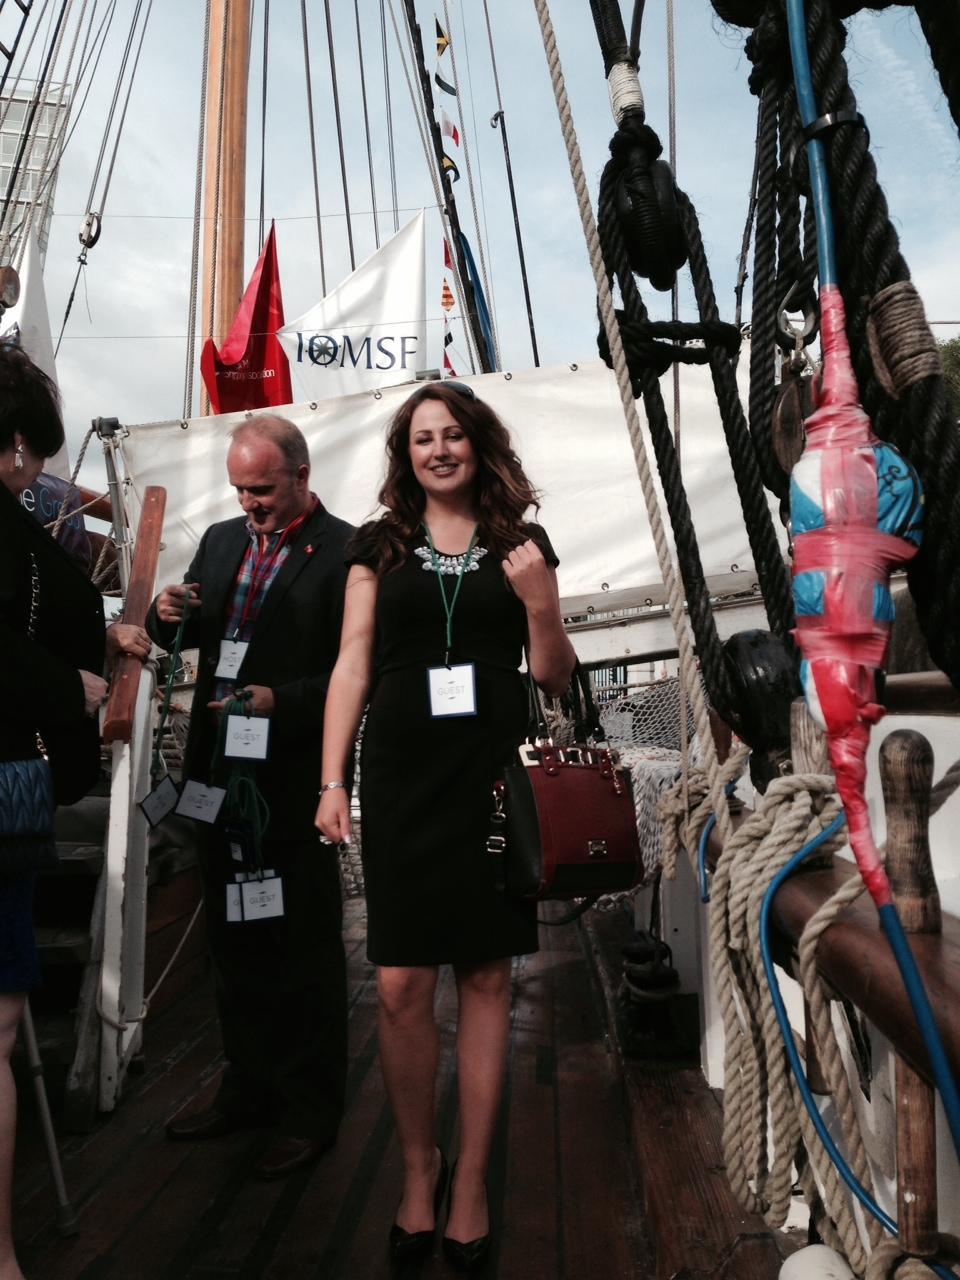 Jo-at-ukwa-conference-on-boat.jpg